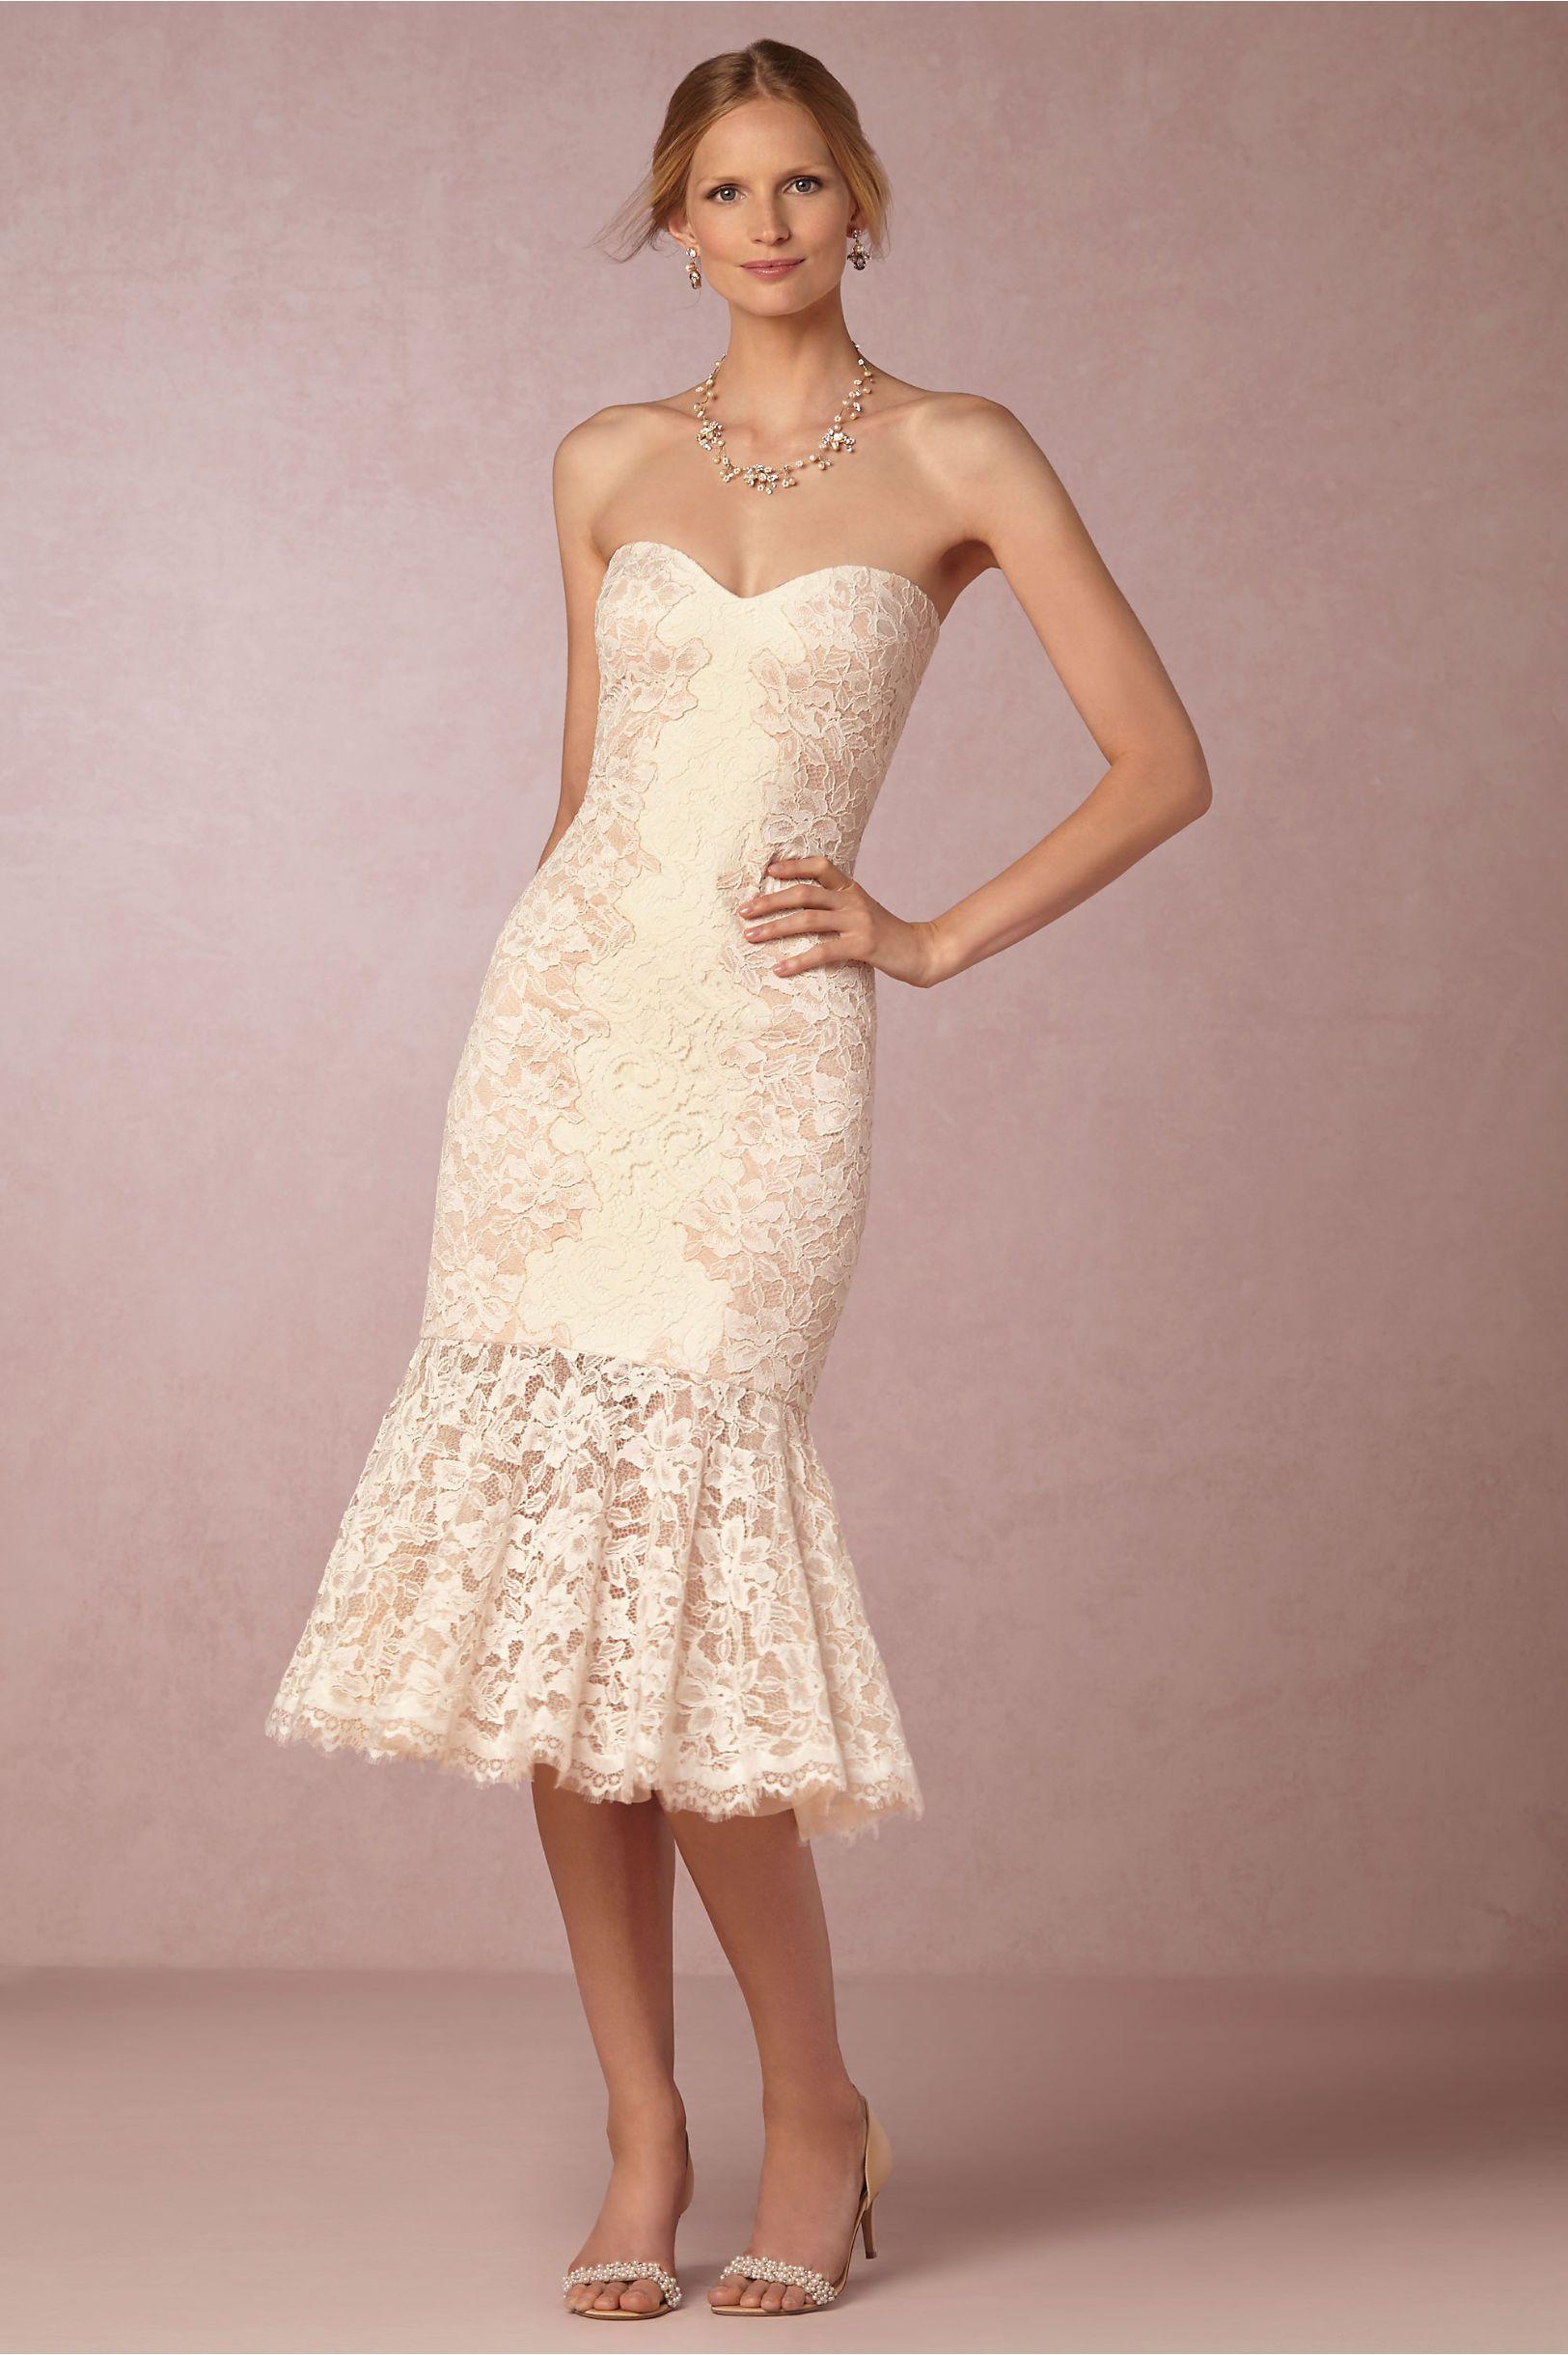 Venetia Dress In New At BHLDN